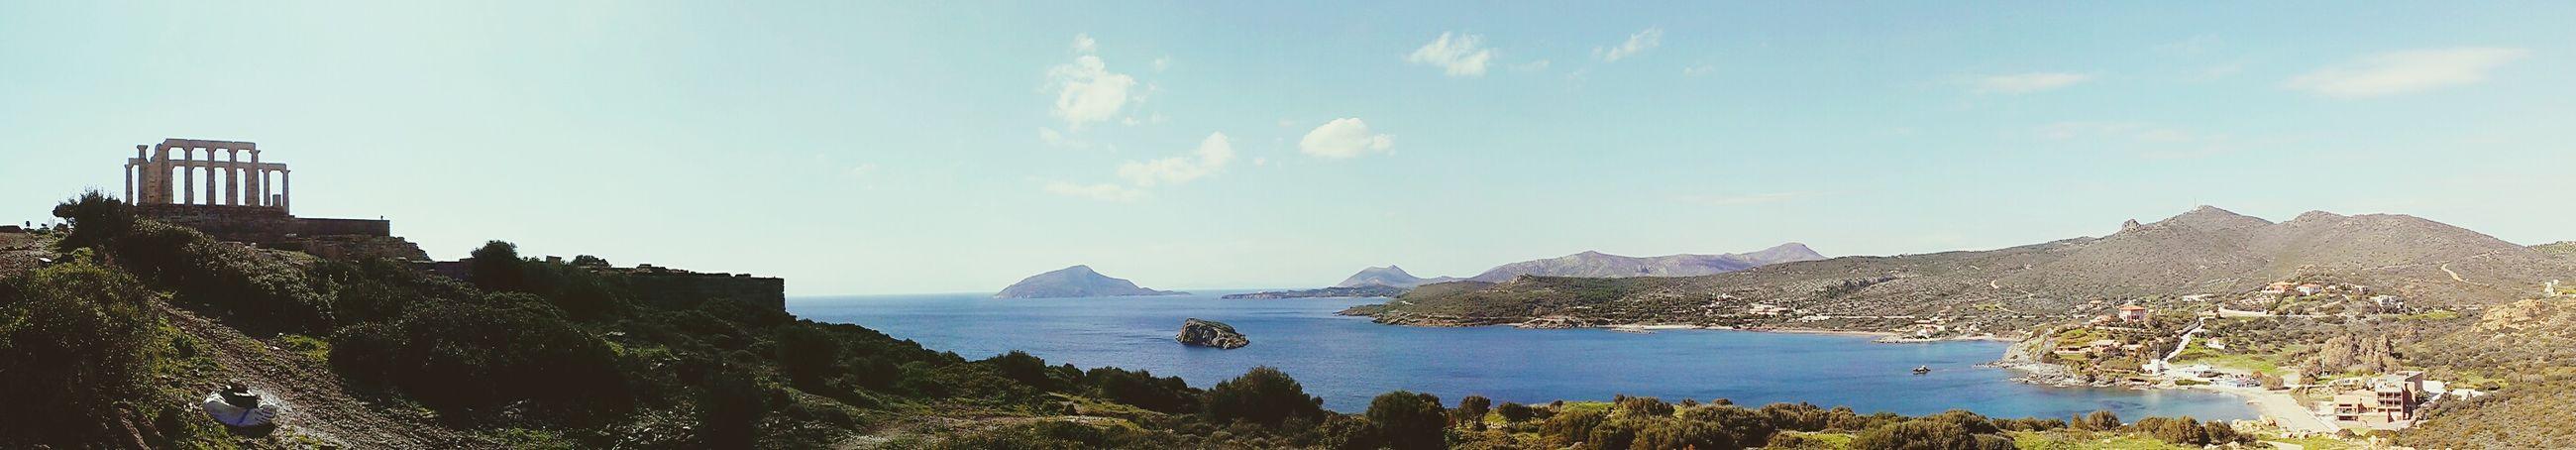 Greece Travelingtheworld  Roadtrip Countryside